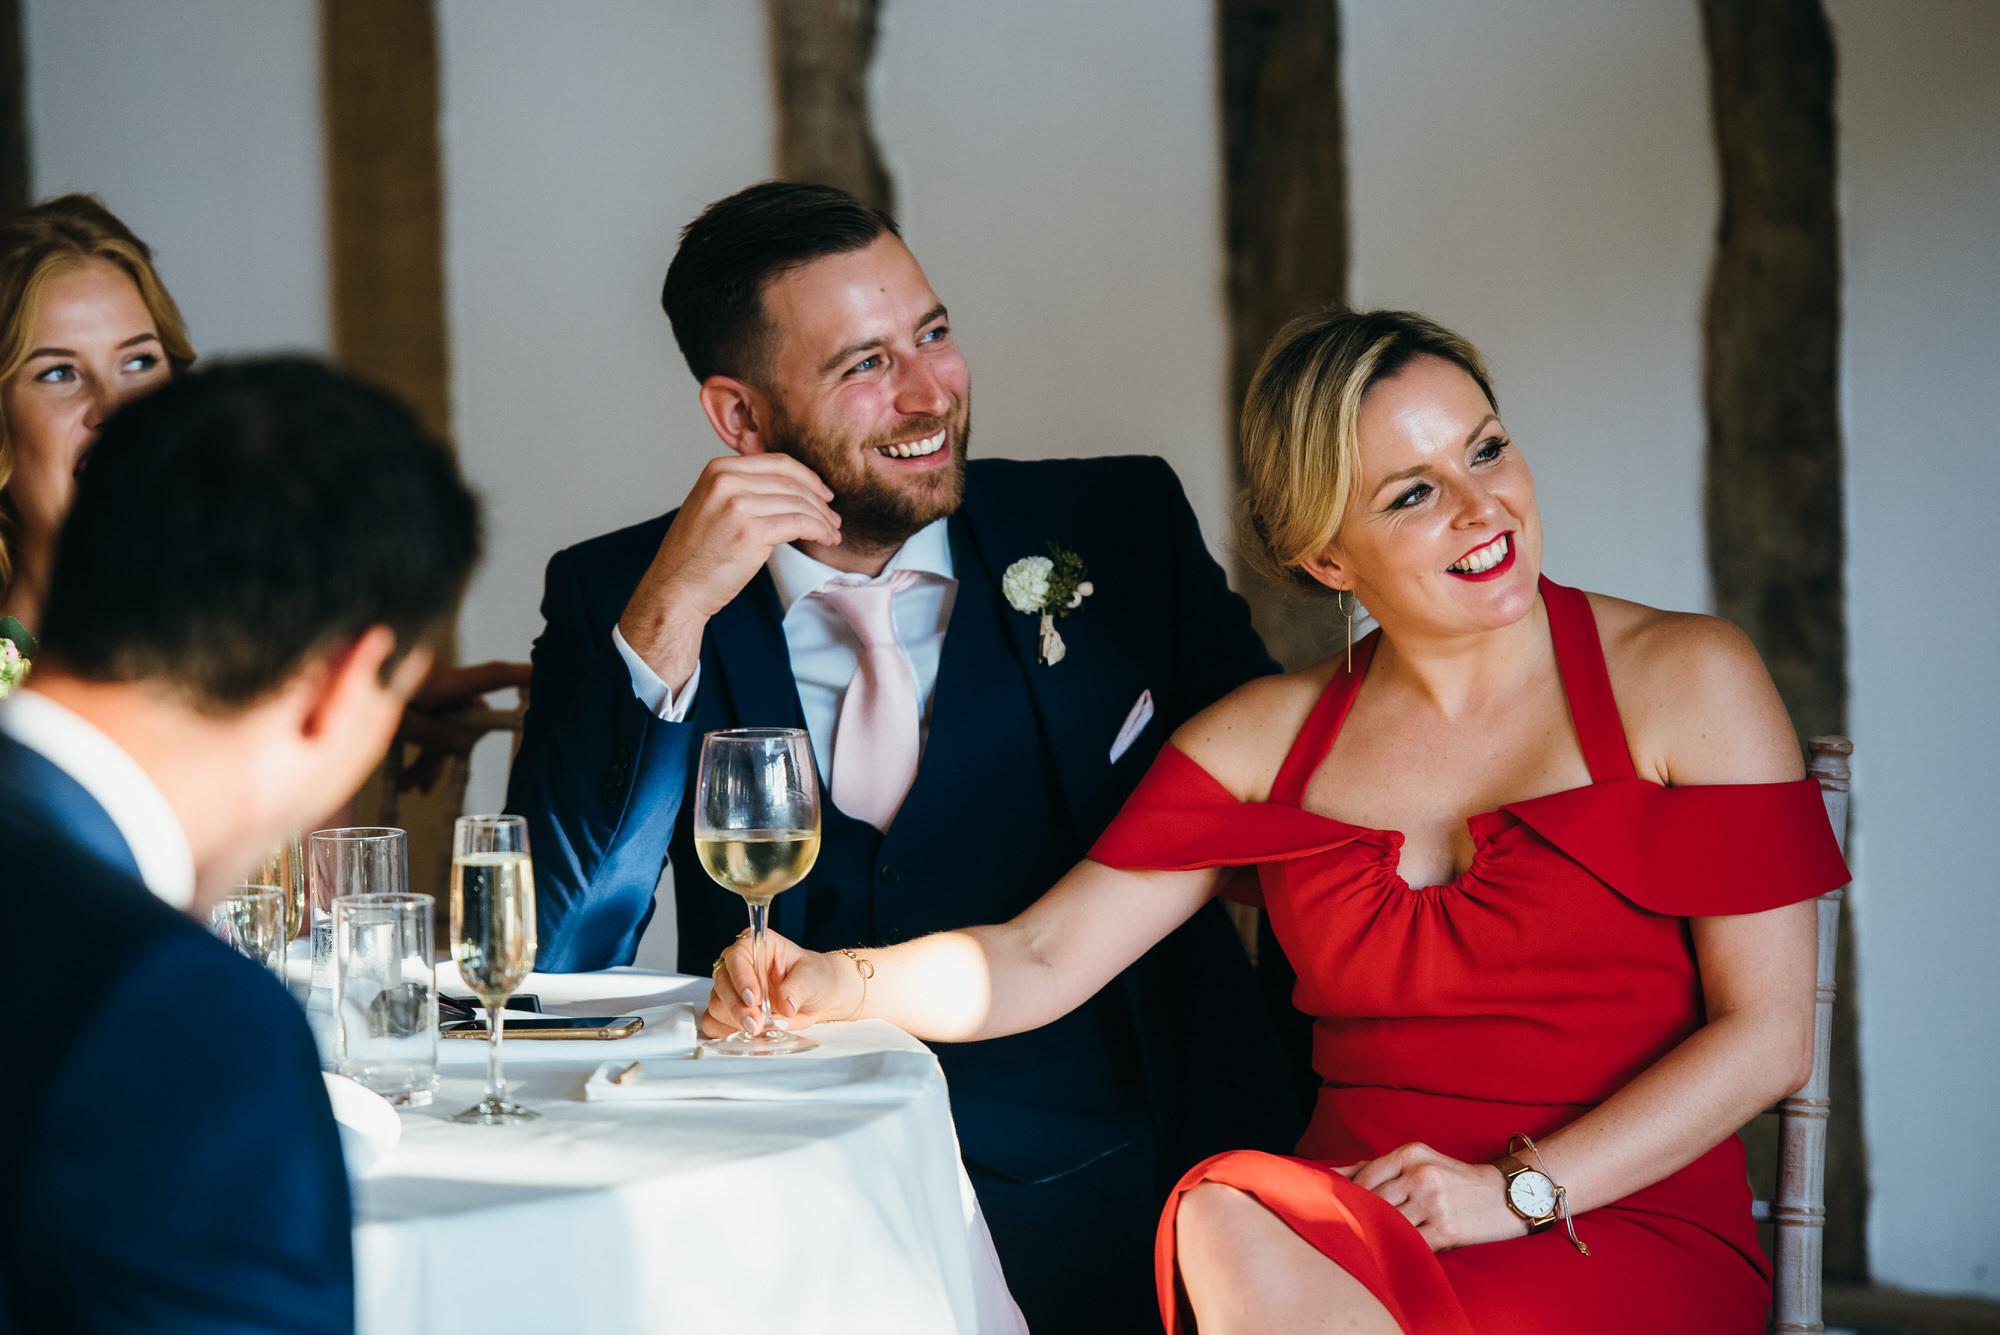 Colville hall wedding speech reactions